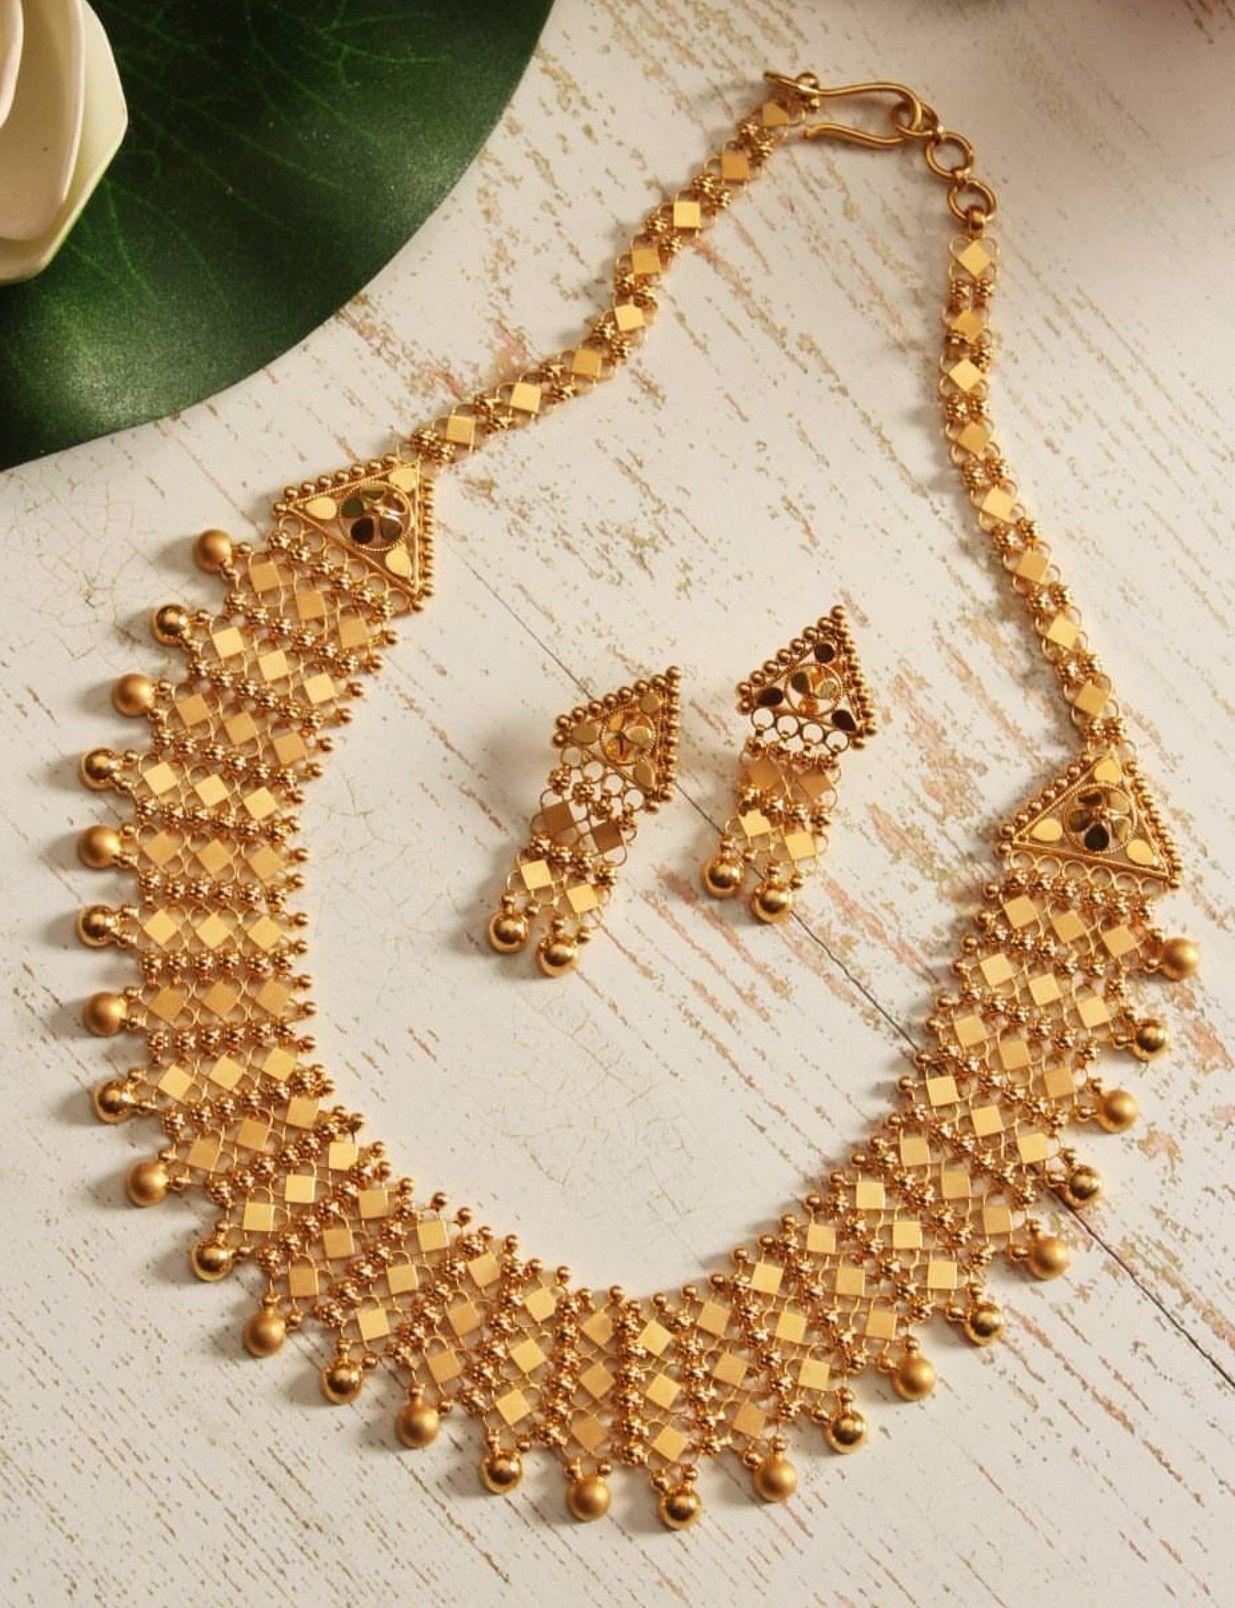 Pin by vaibhavi vora on jewellery pinterest india jewelry jewel